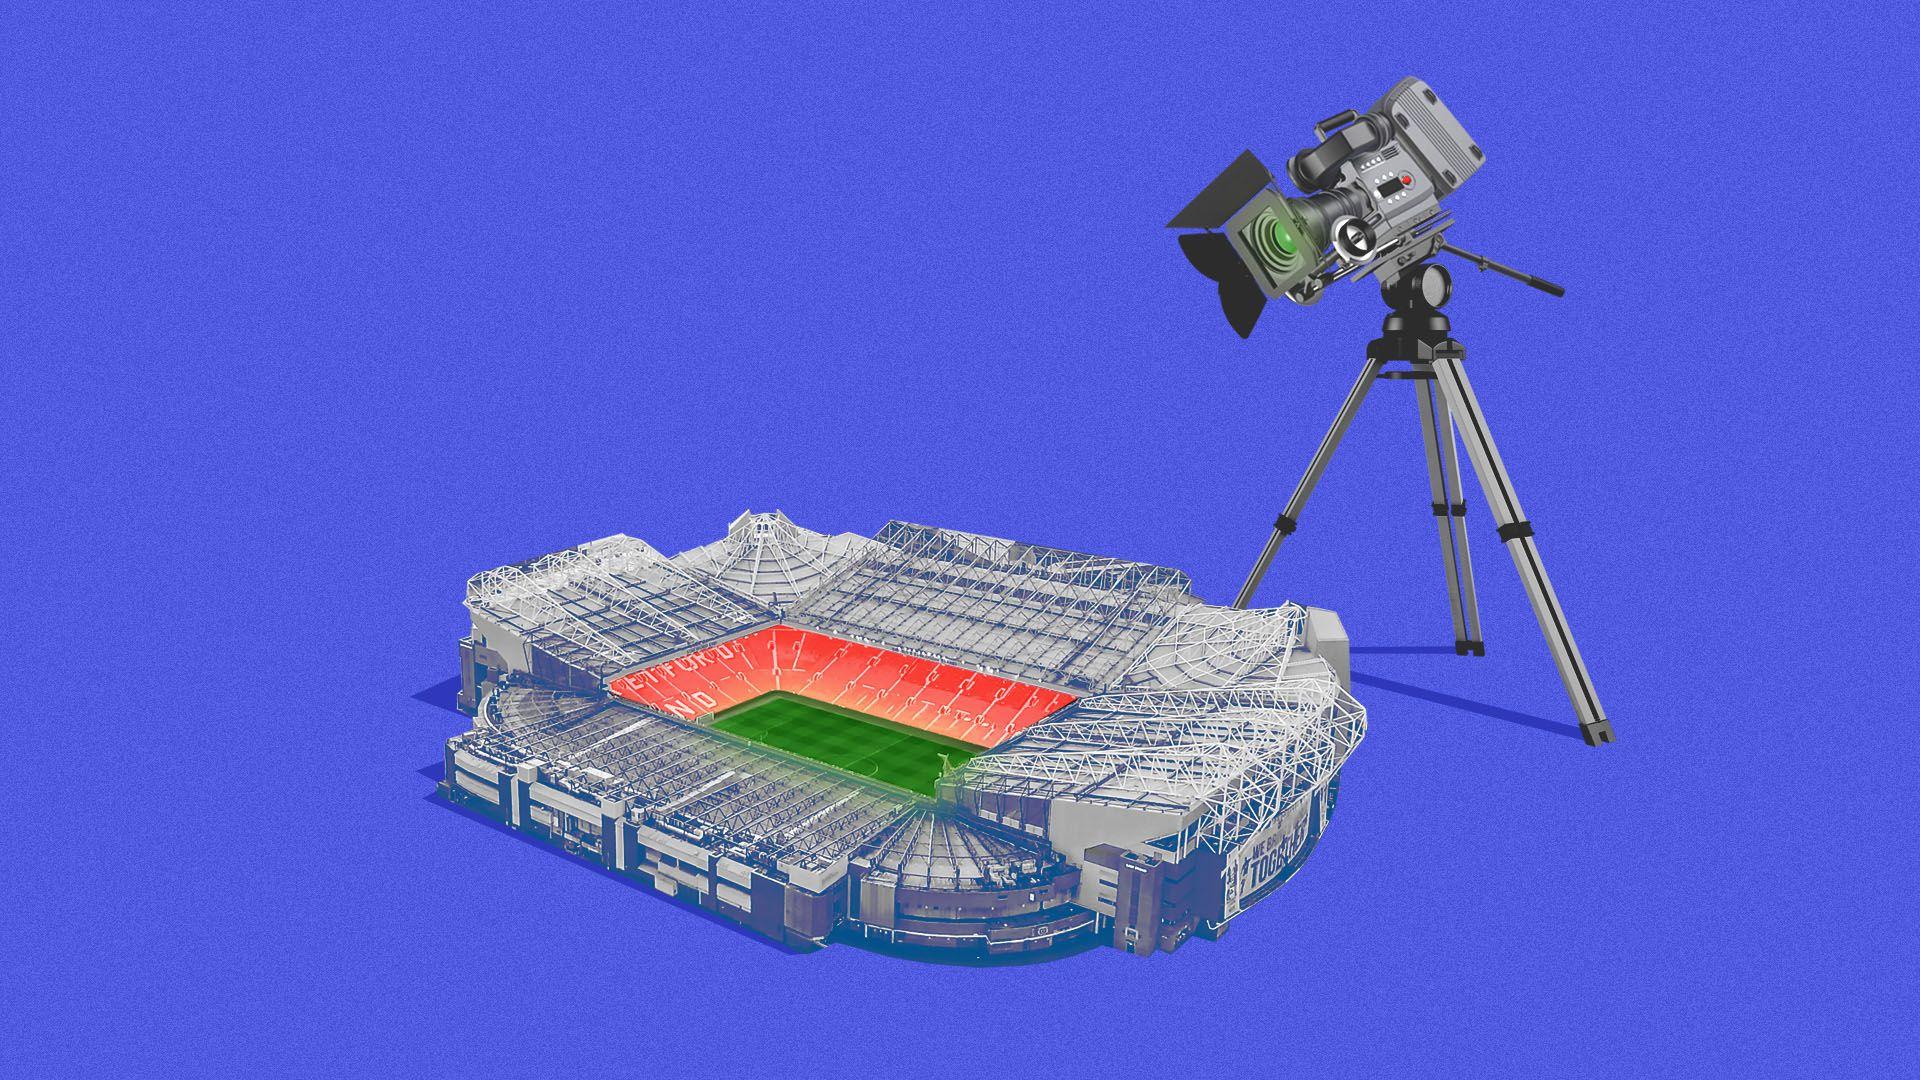 Illustration of giant TV camera over a sports stadium